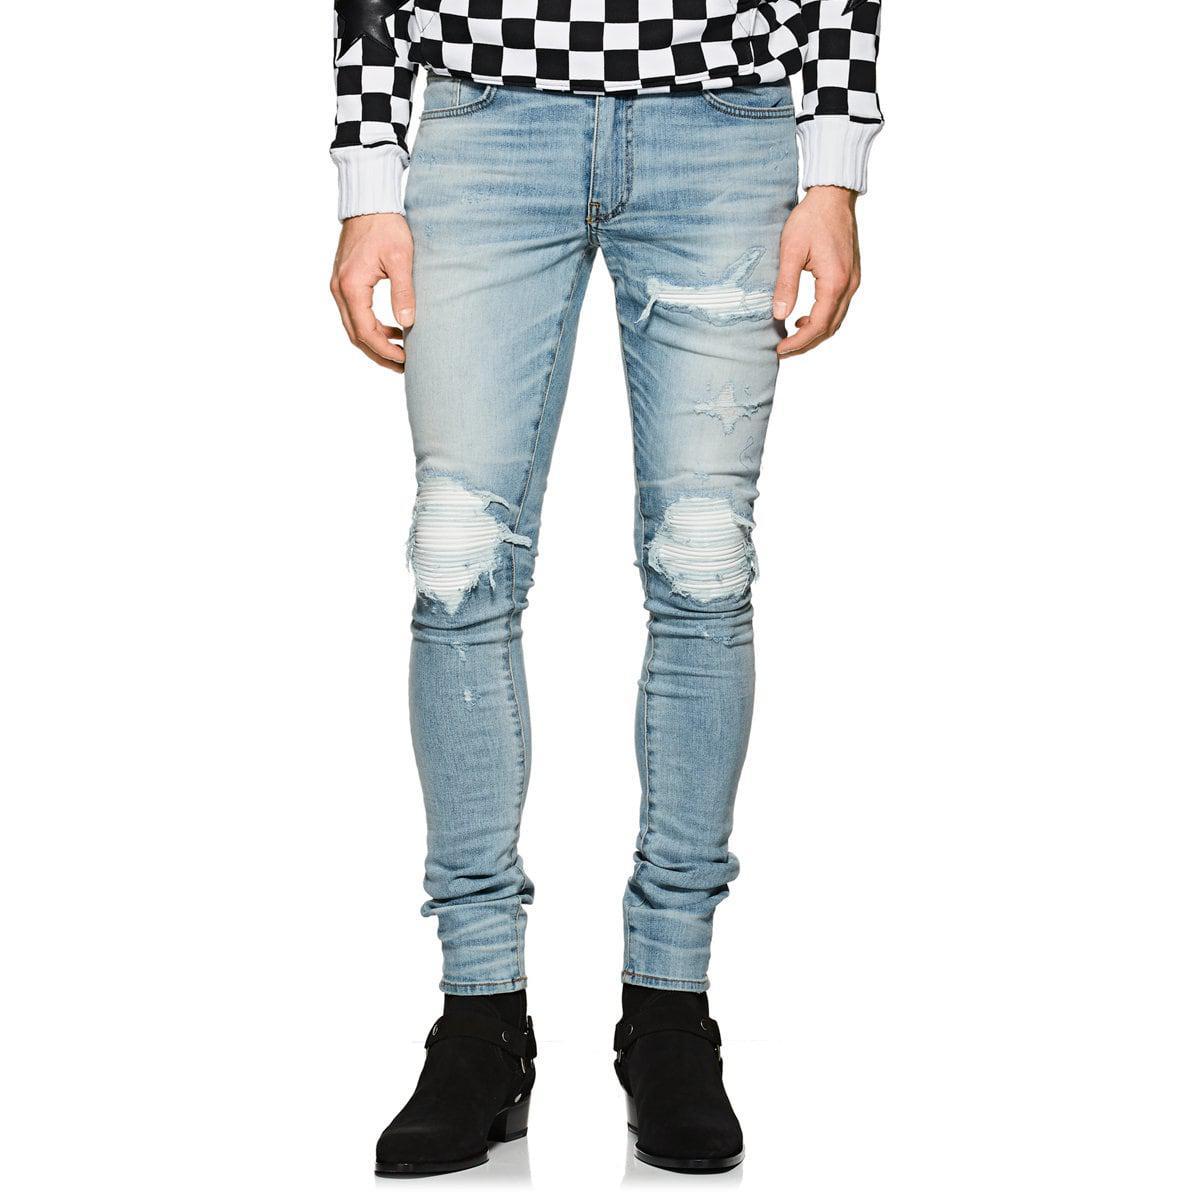 Mx1 Men Leather Inset Blue Amiri In For Slim Lyst Jeans 4jLAq35R